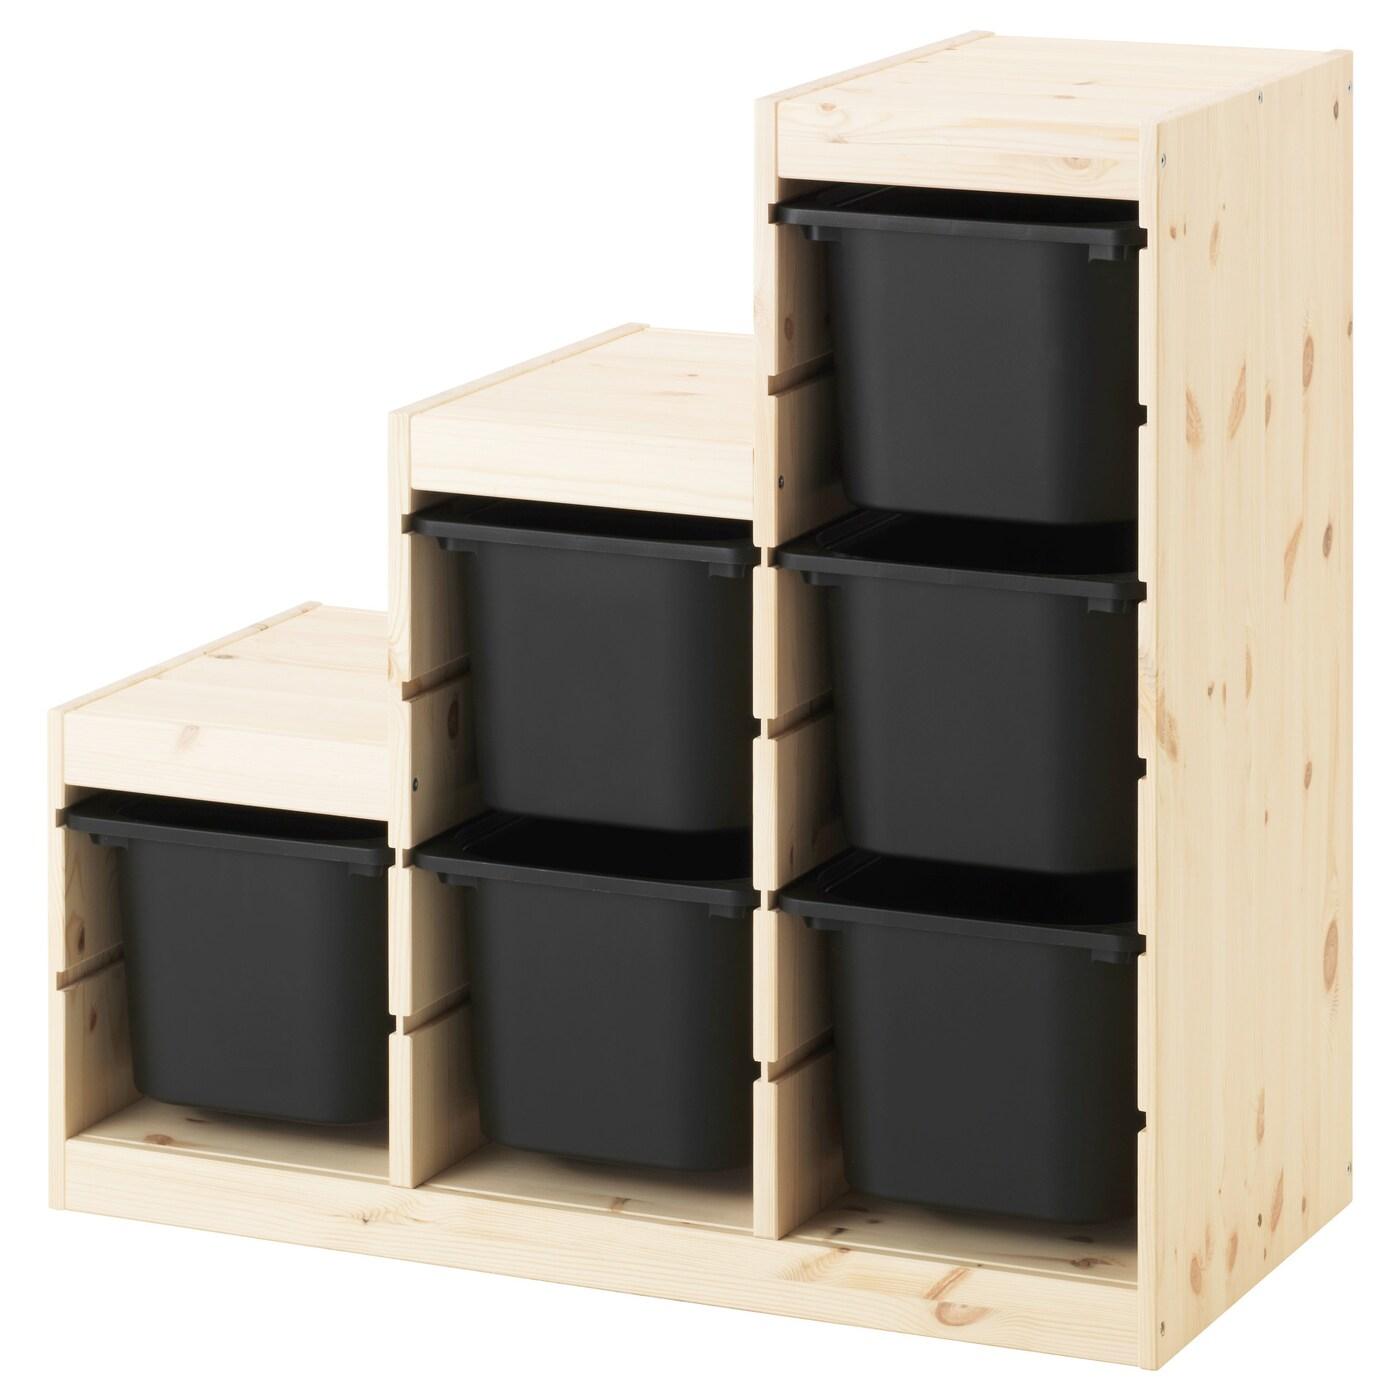 Trofast storage combination pine black 94x44x91 cm ikea - Escaleras para literas ikea ...